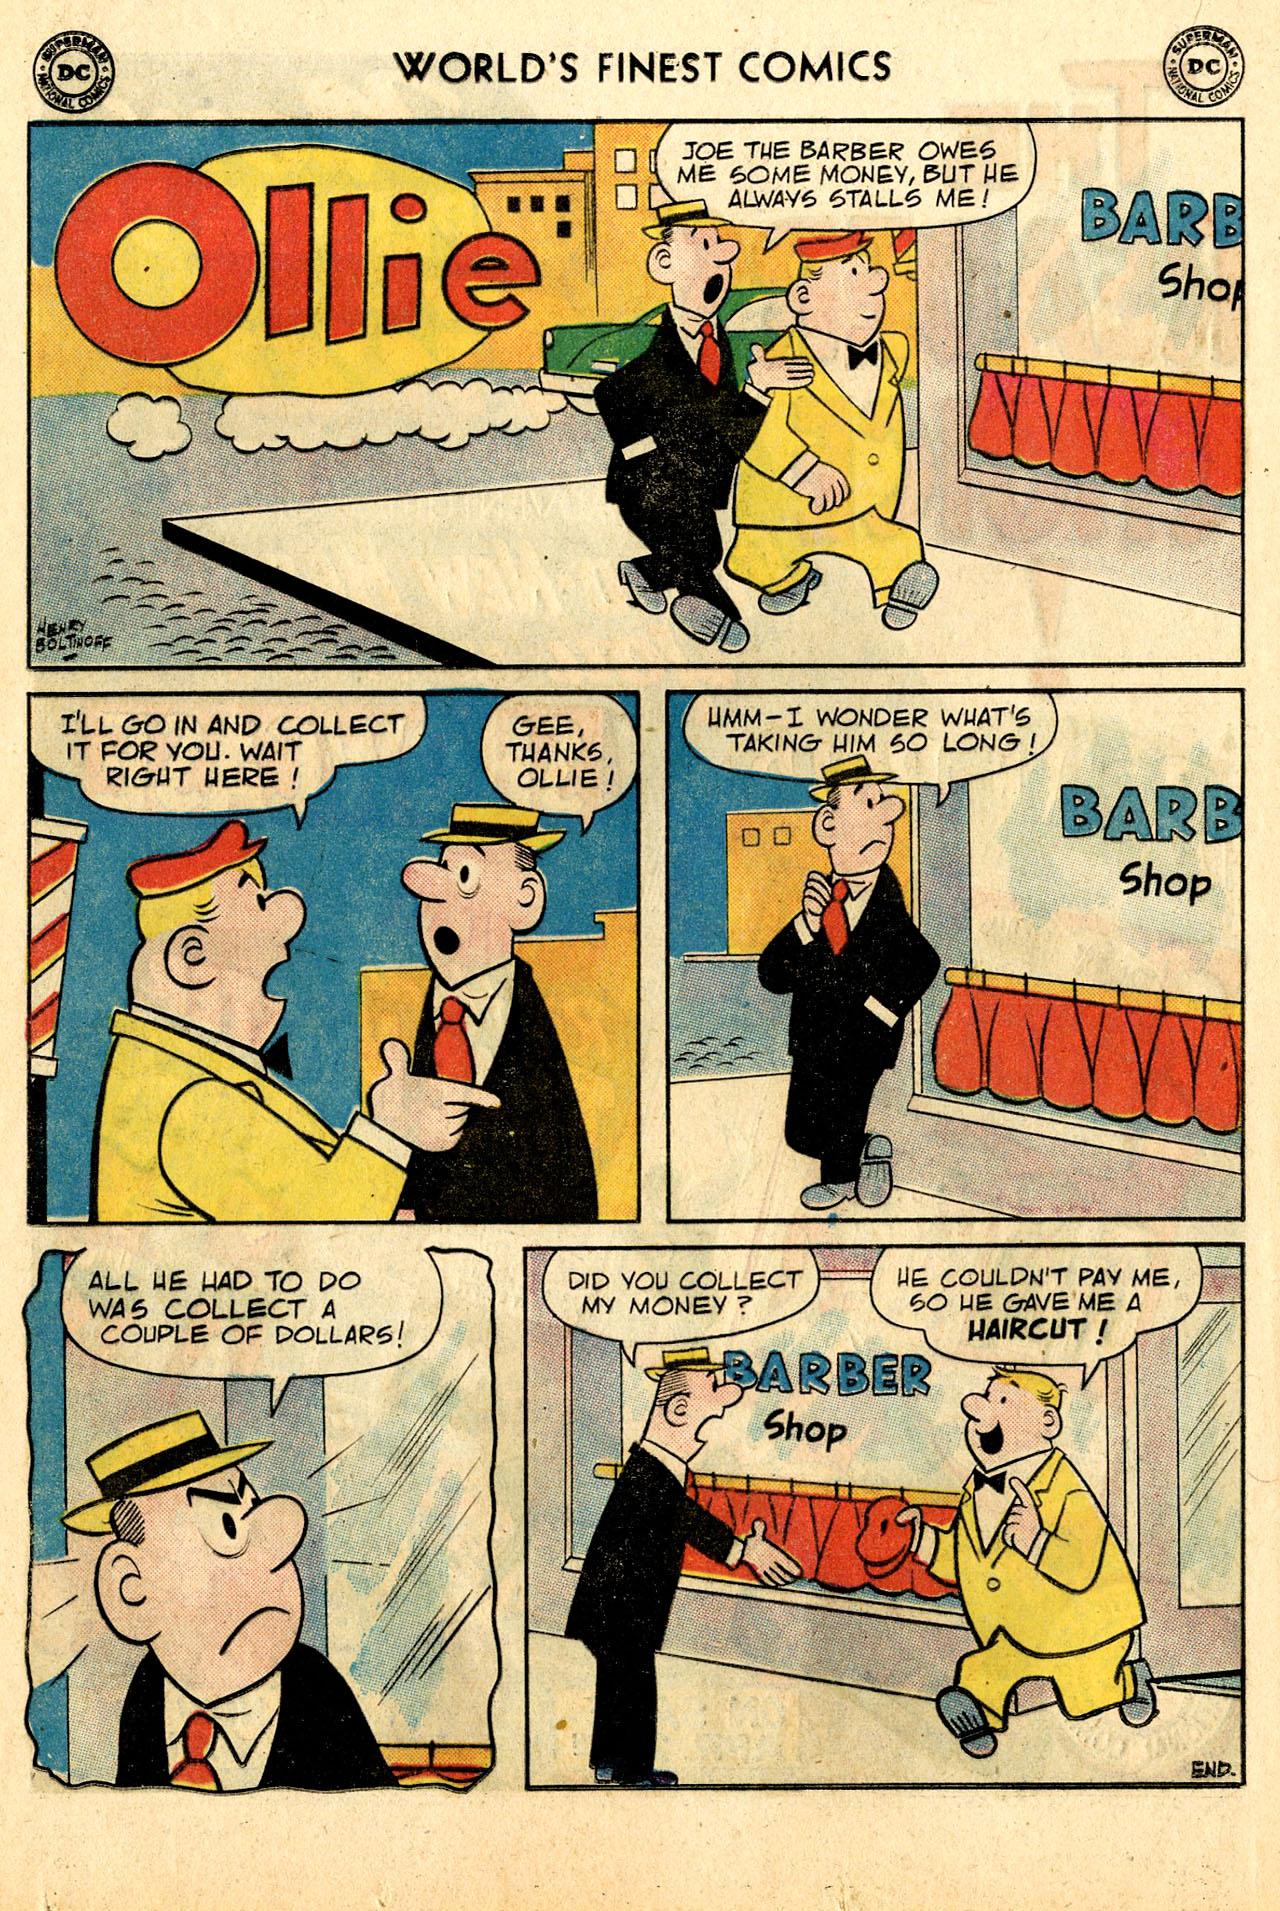 Read online World's Finest Comics comic -  Issue #110 - 16